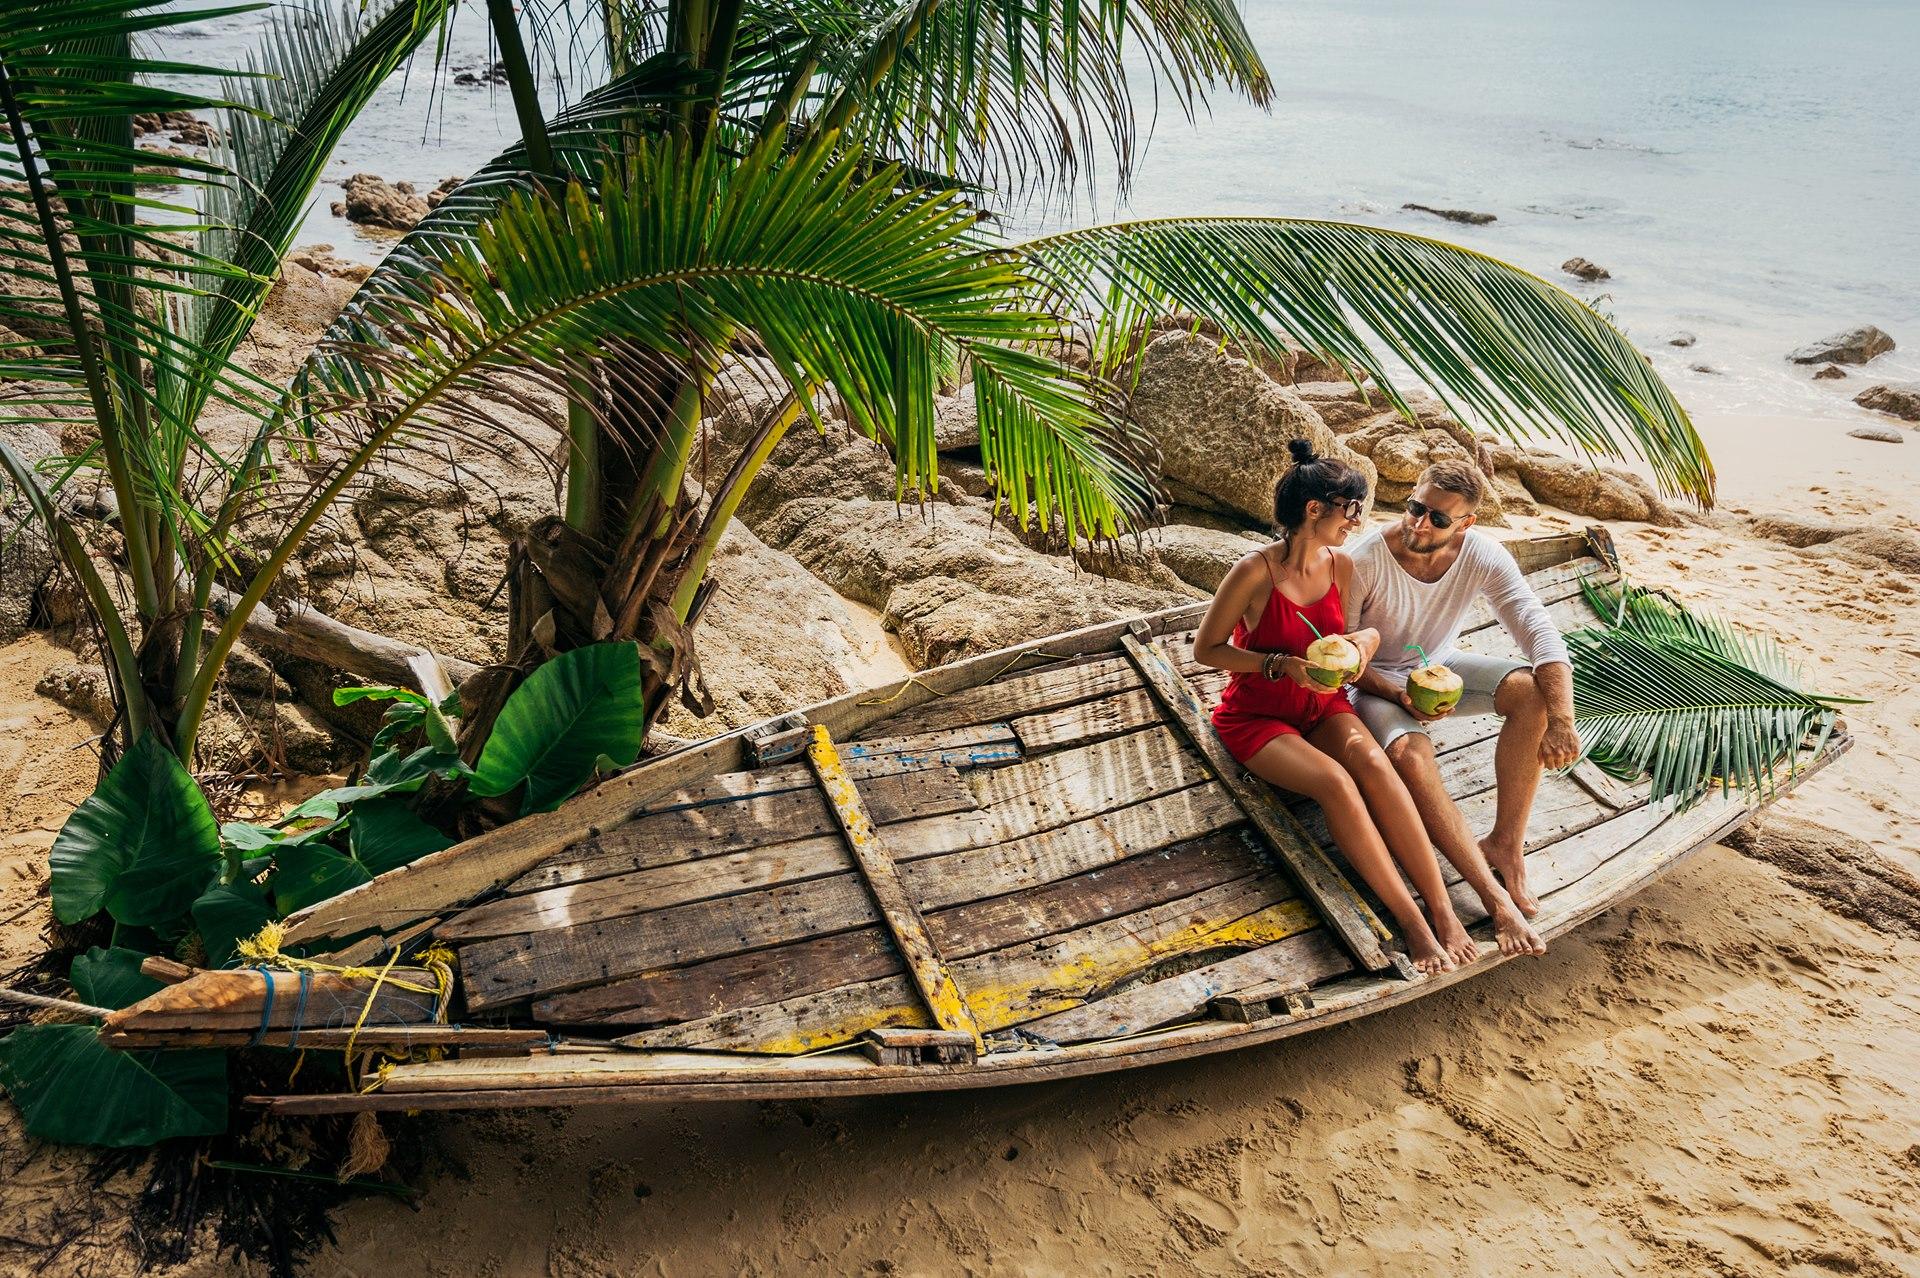 Bali. Your perfect honeymoon destination.